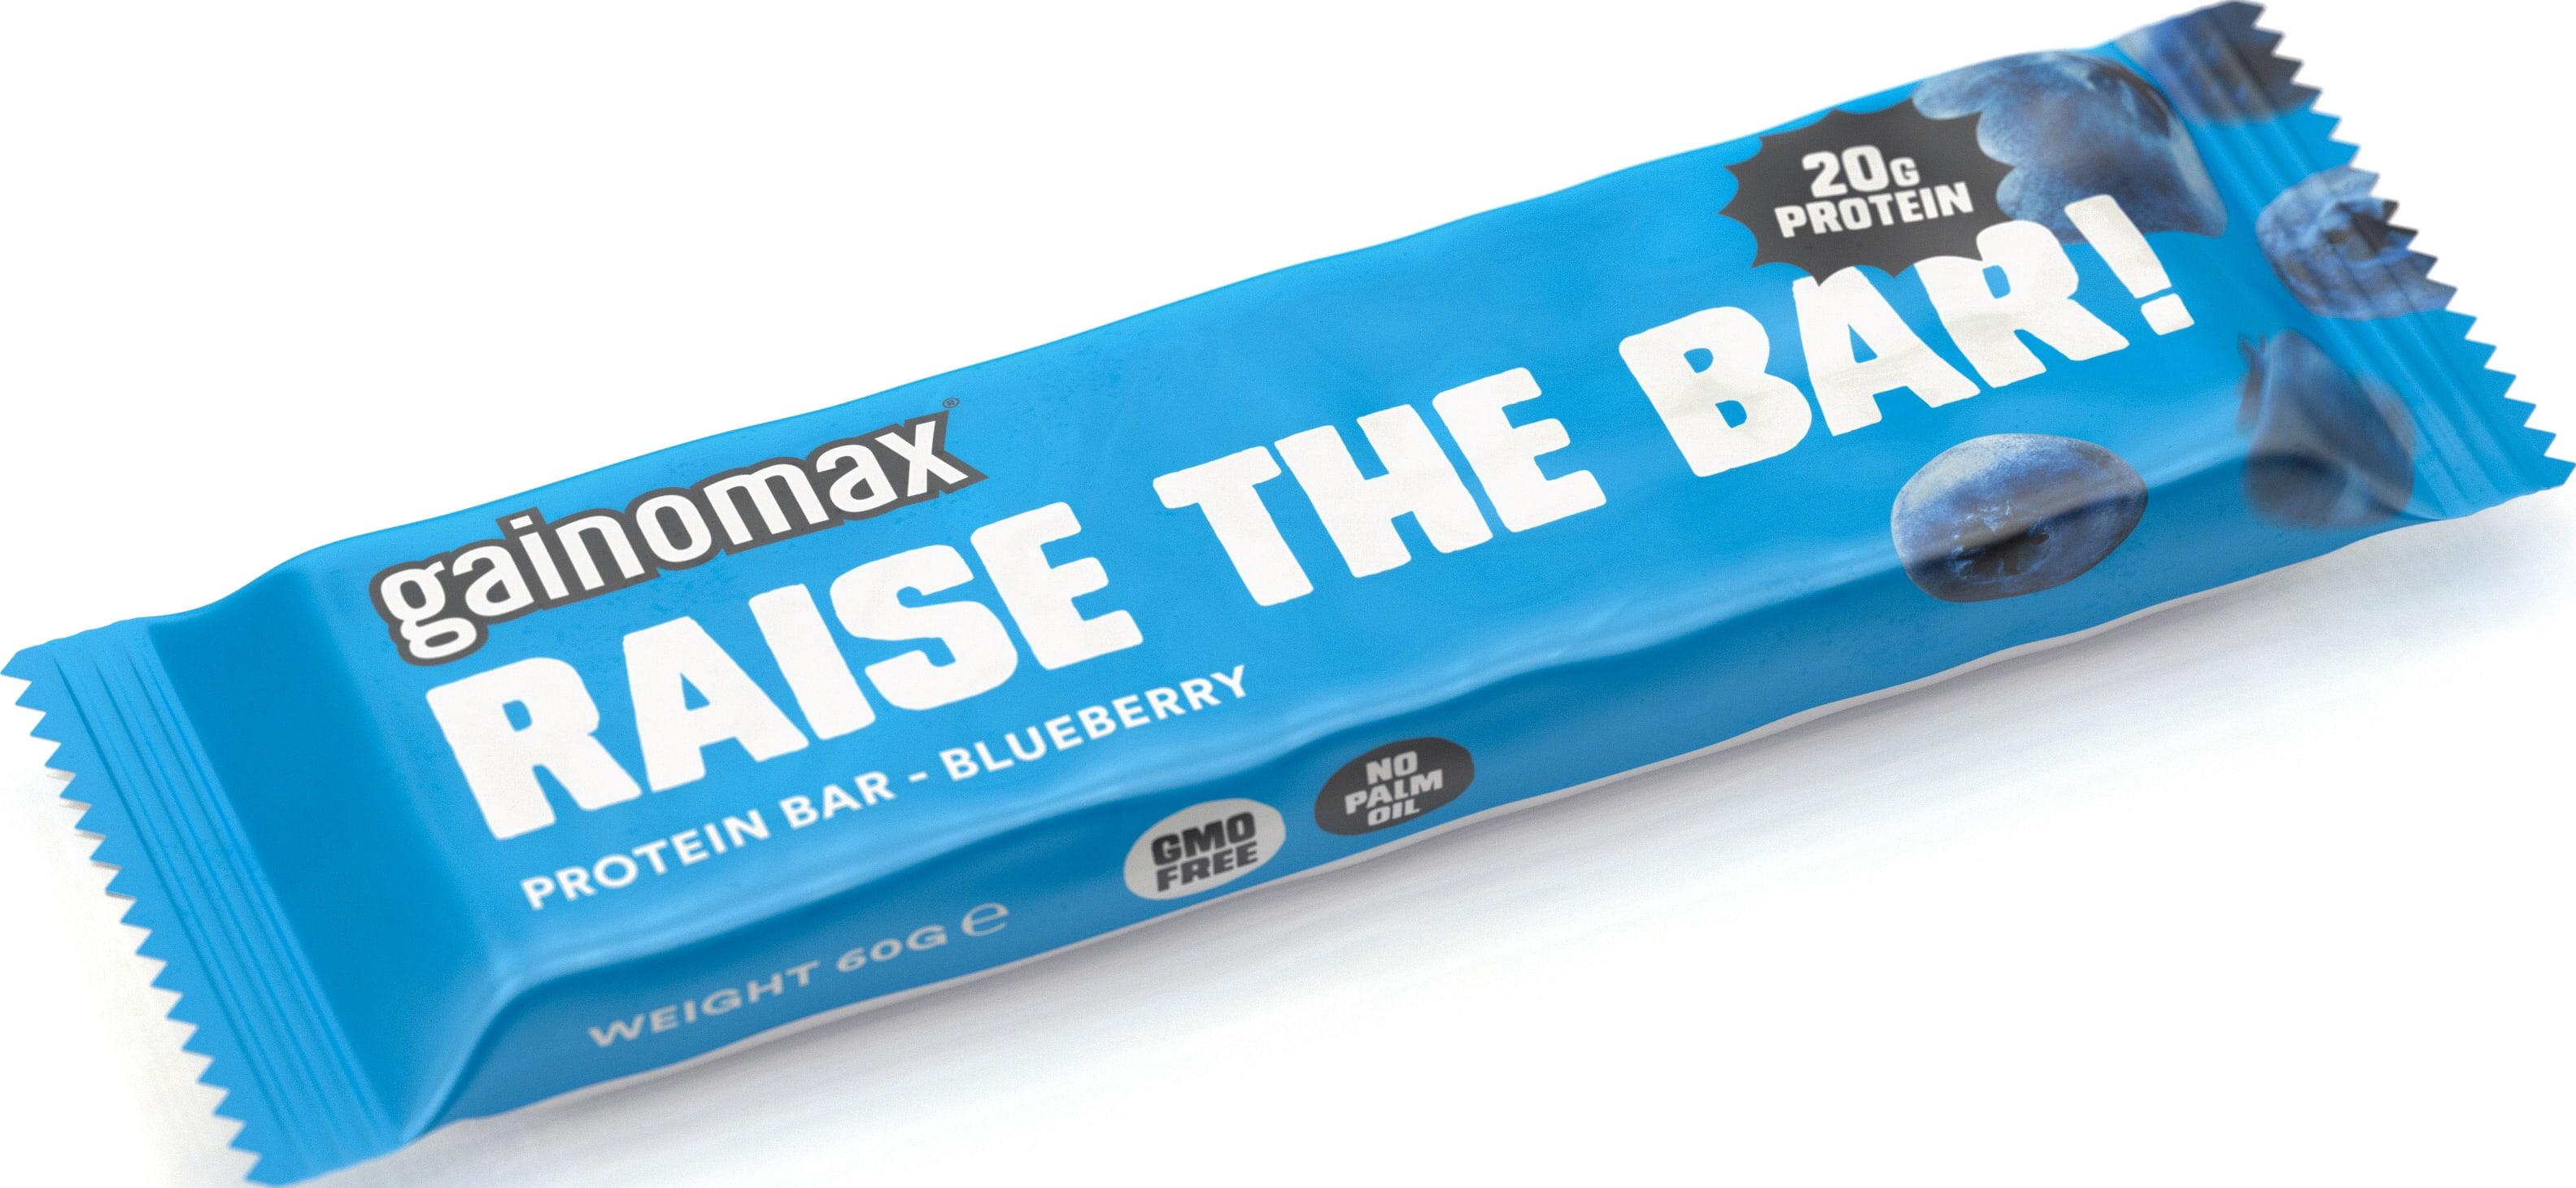 gainomax raise the bar